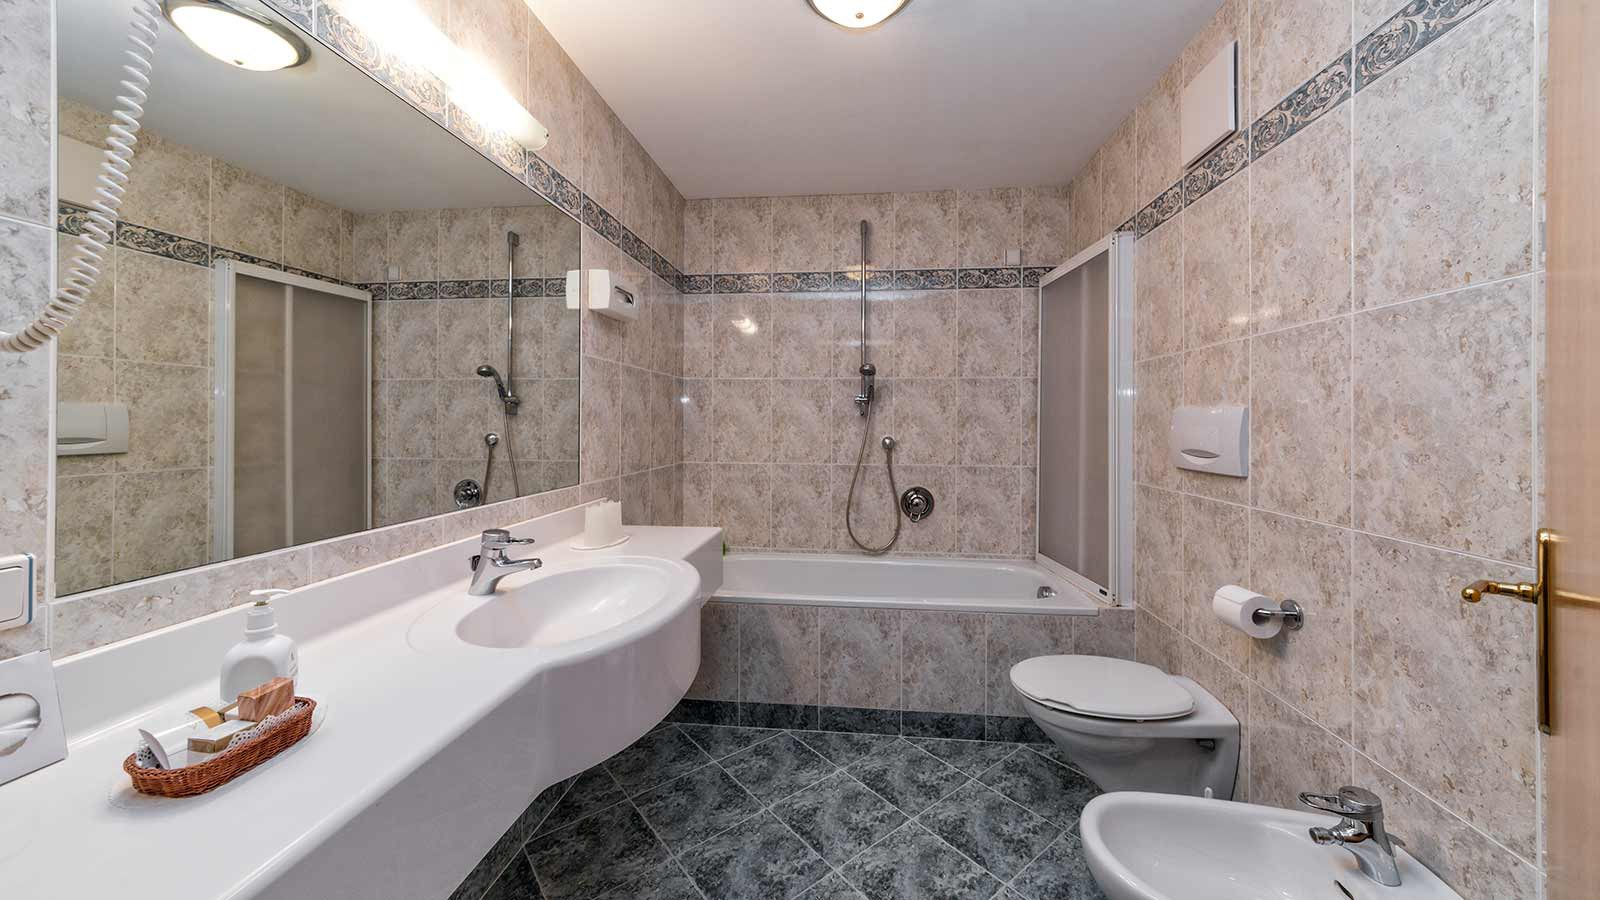 Bathrooms- Hotel Interski, Selva Val Gardena, Italy